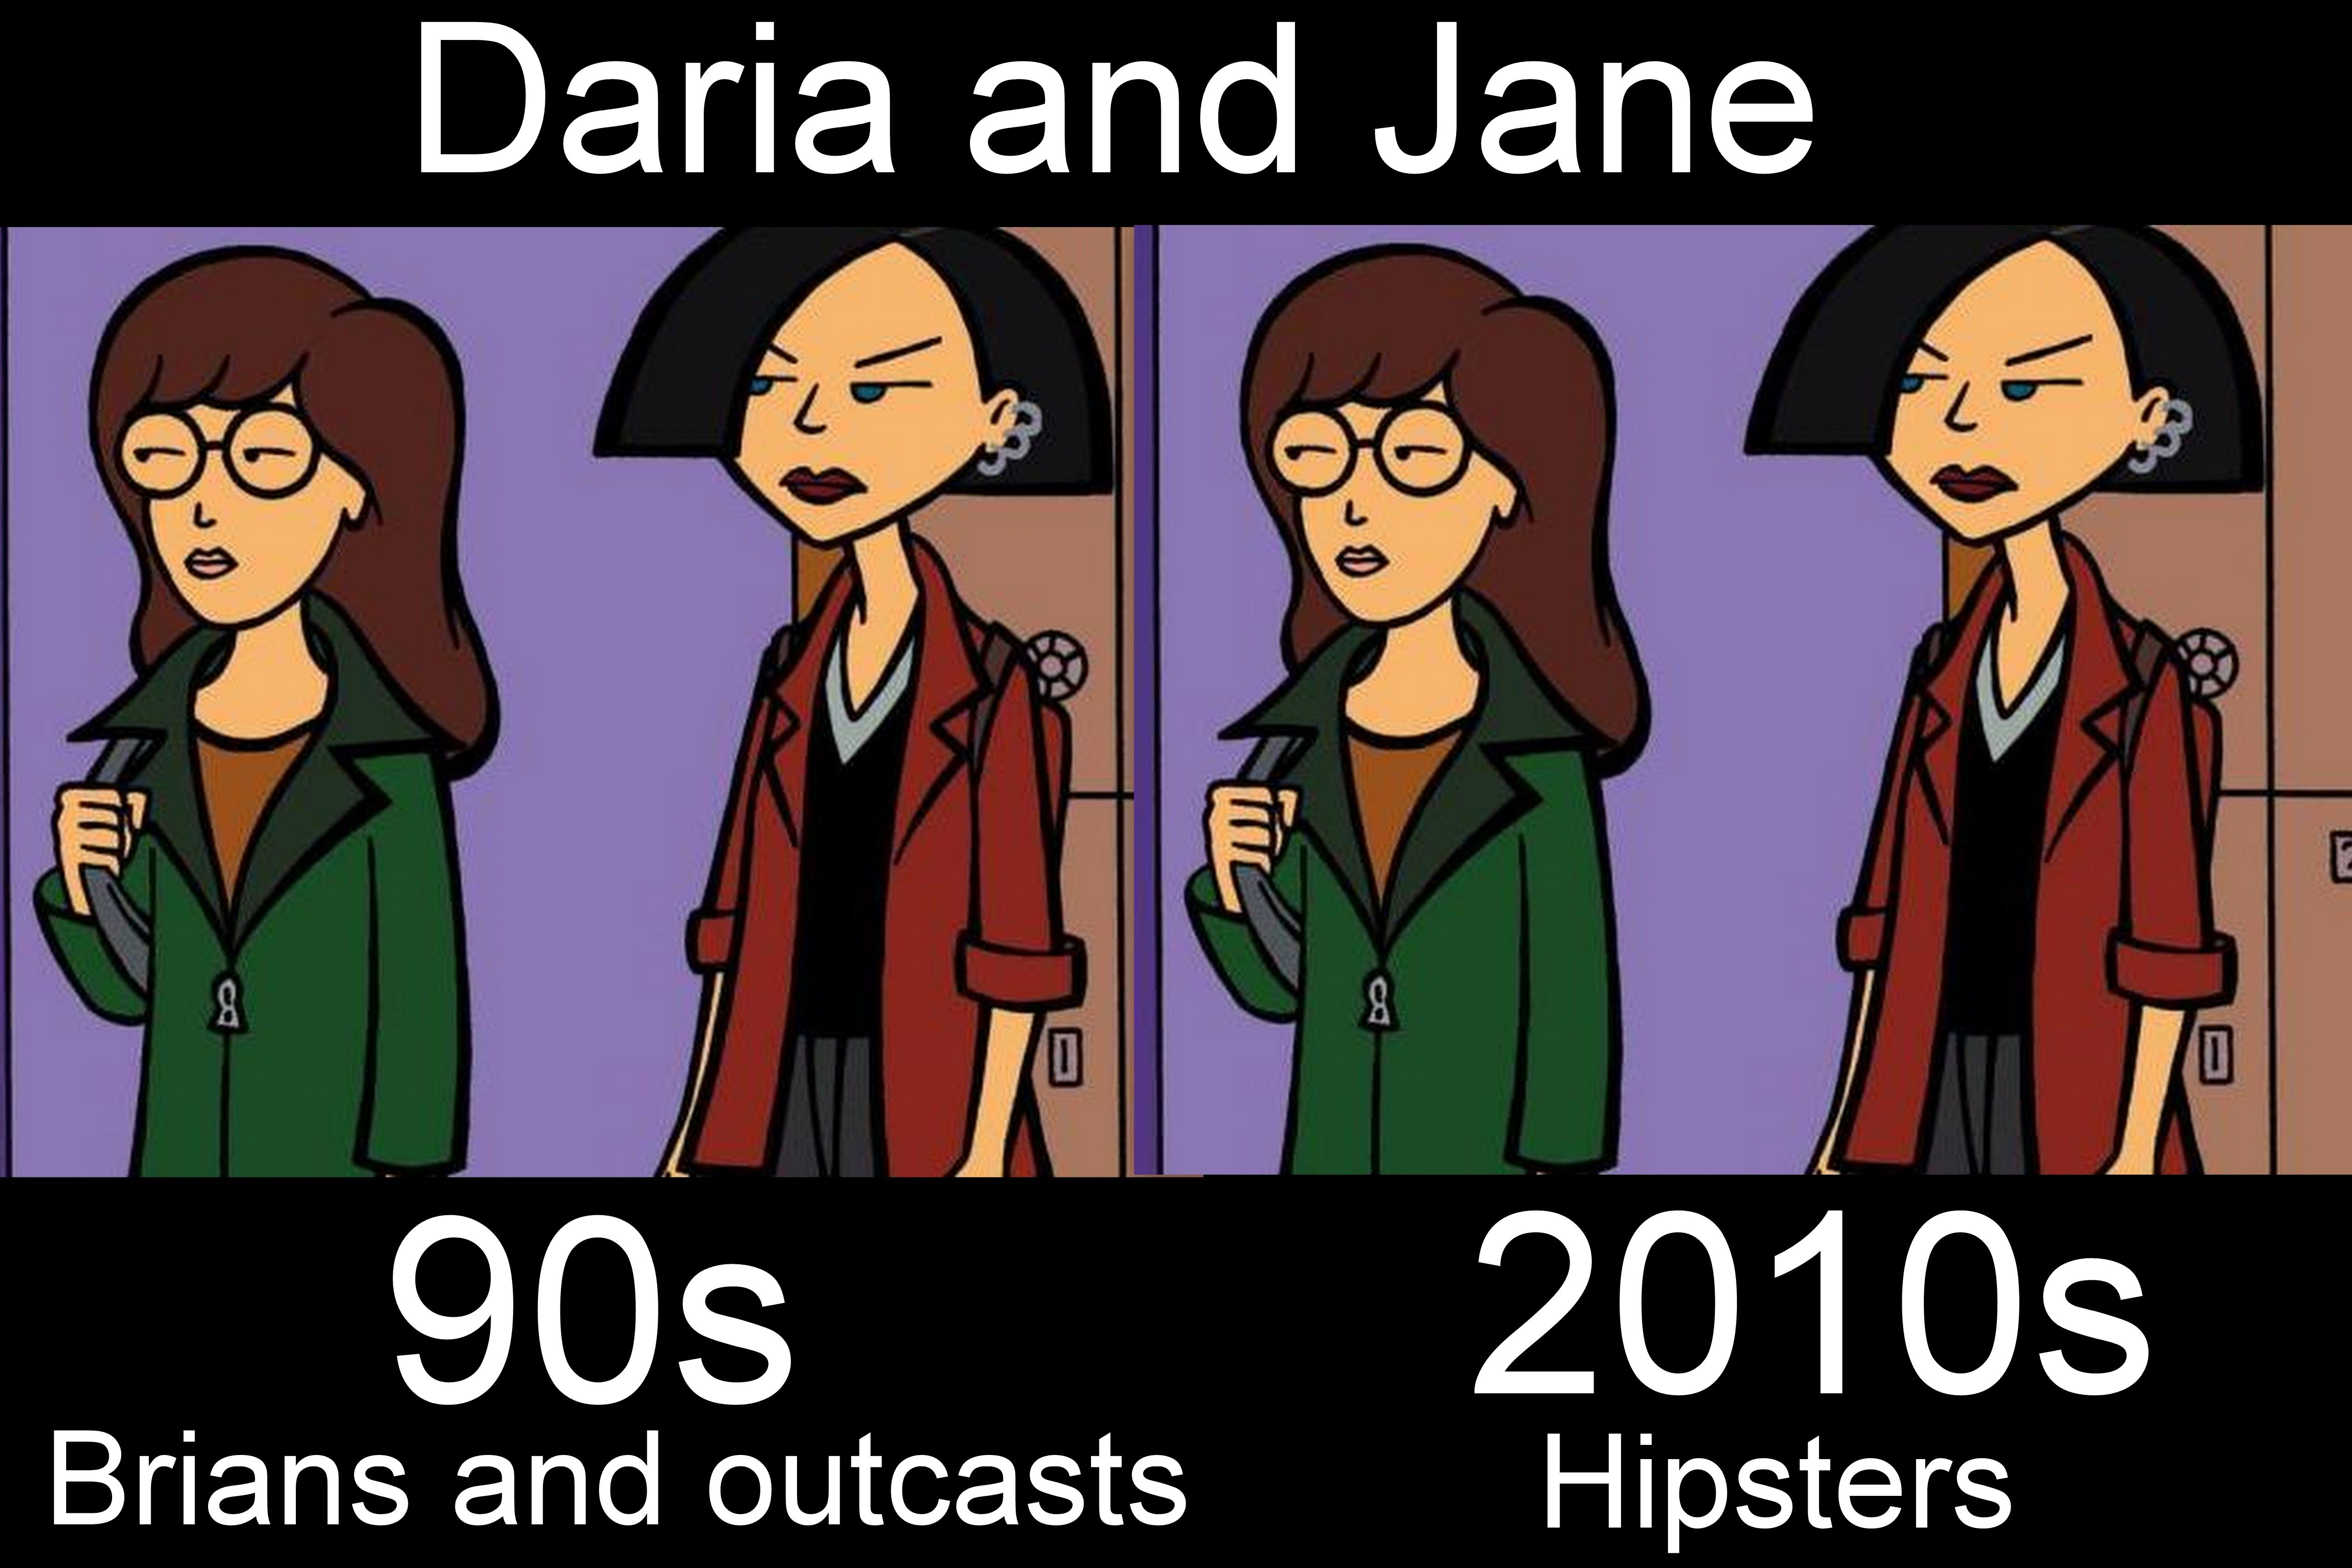 Daria and Jane- So true!